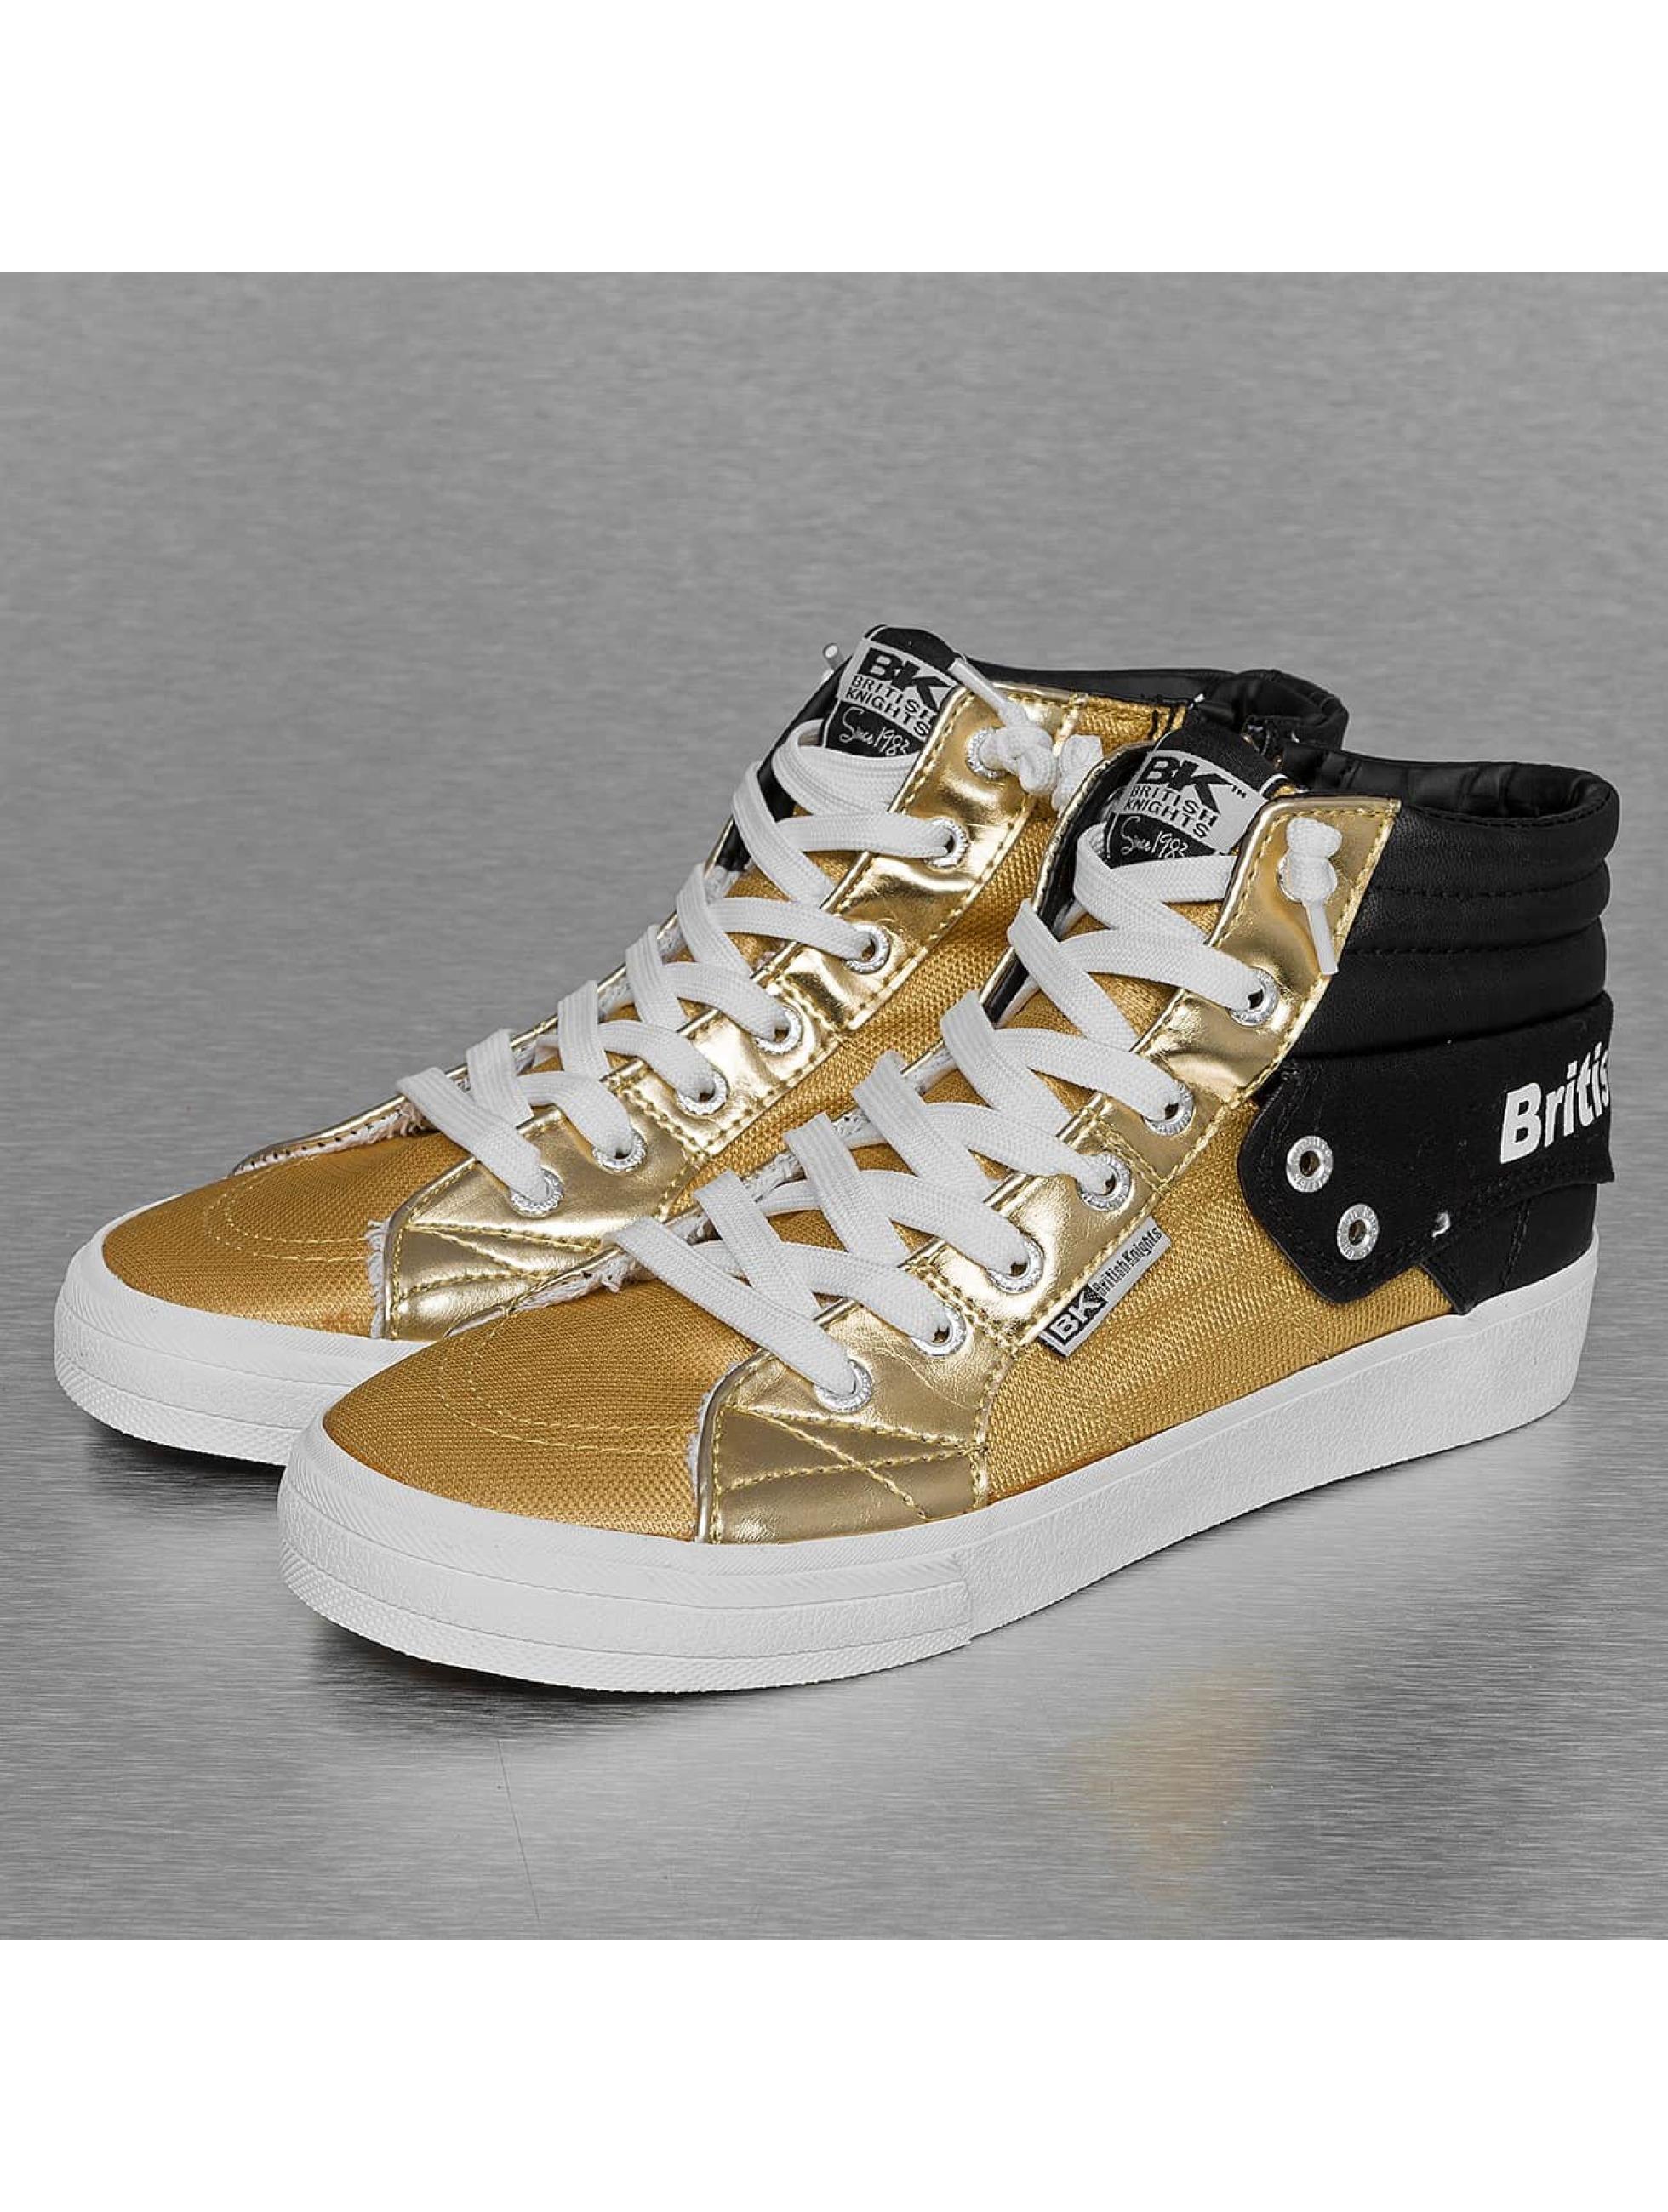 British Knights Frauen Sneaker Rigit Mesh PU in goldfarben